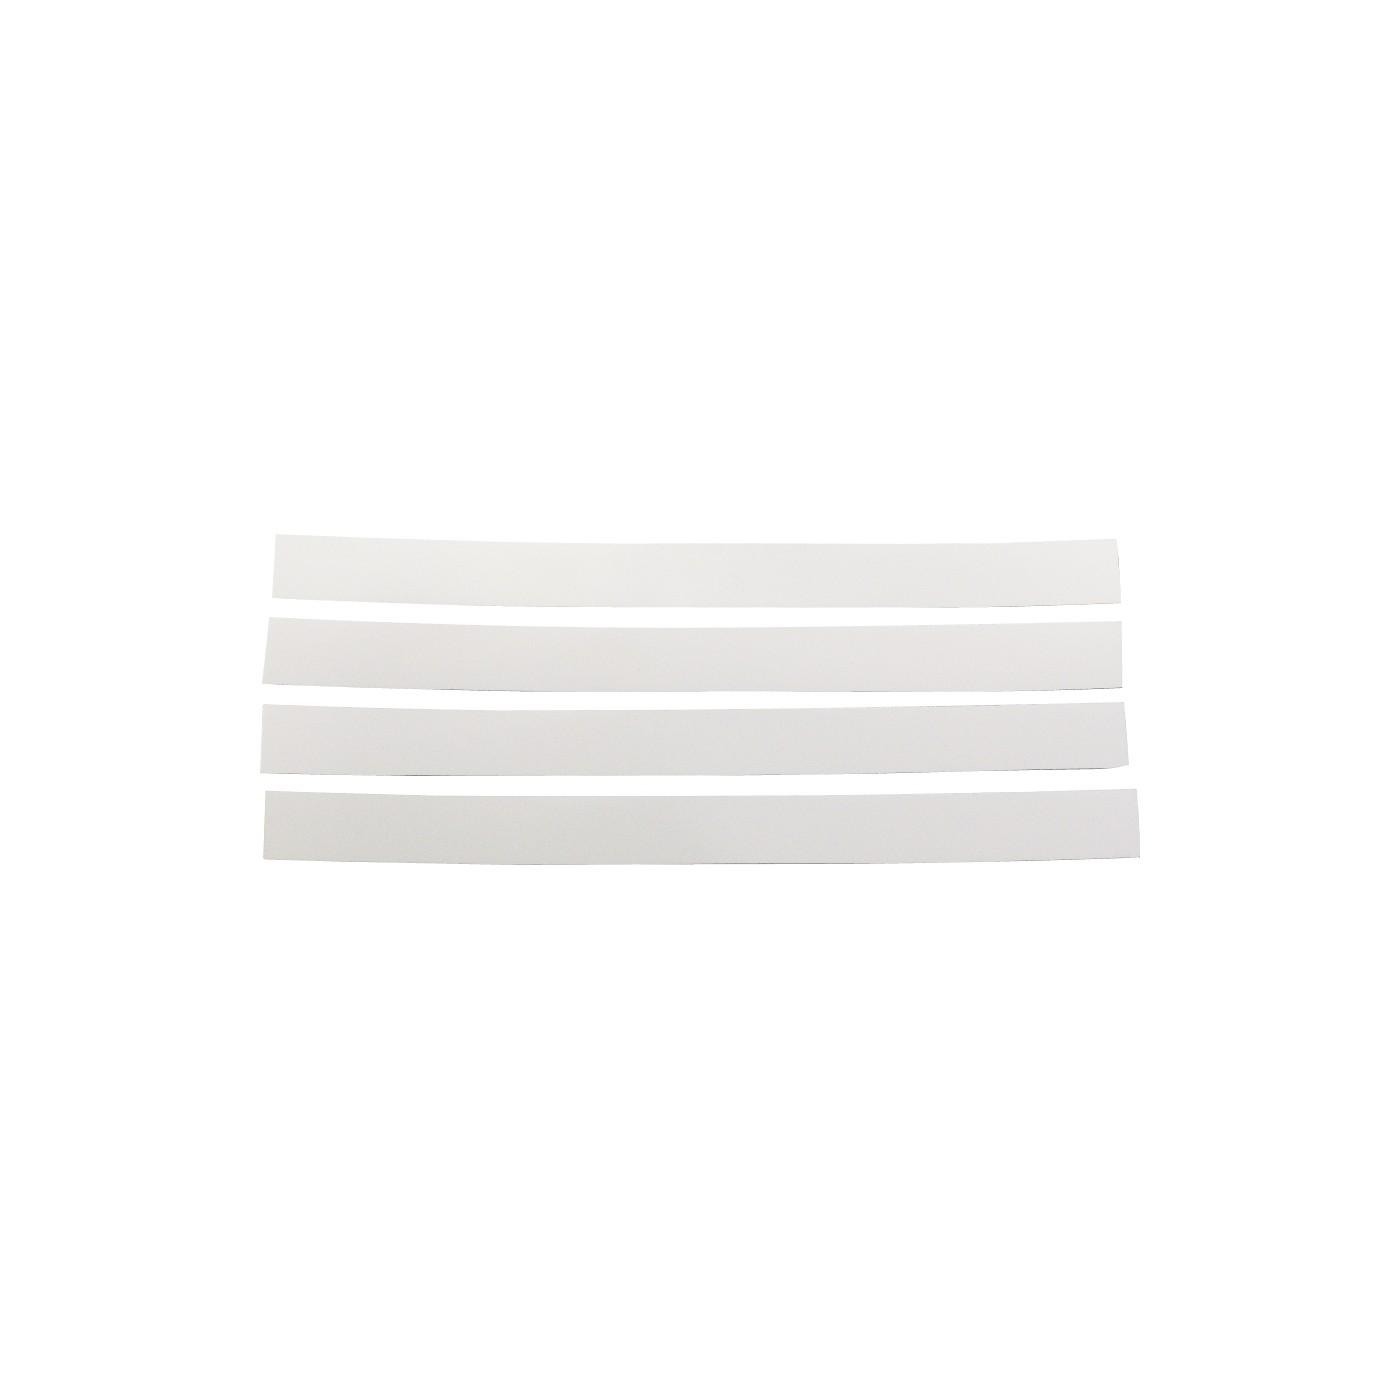 Gibraltar SC-NSC Nylon Snare Cord Strap thumbnail